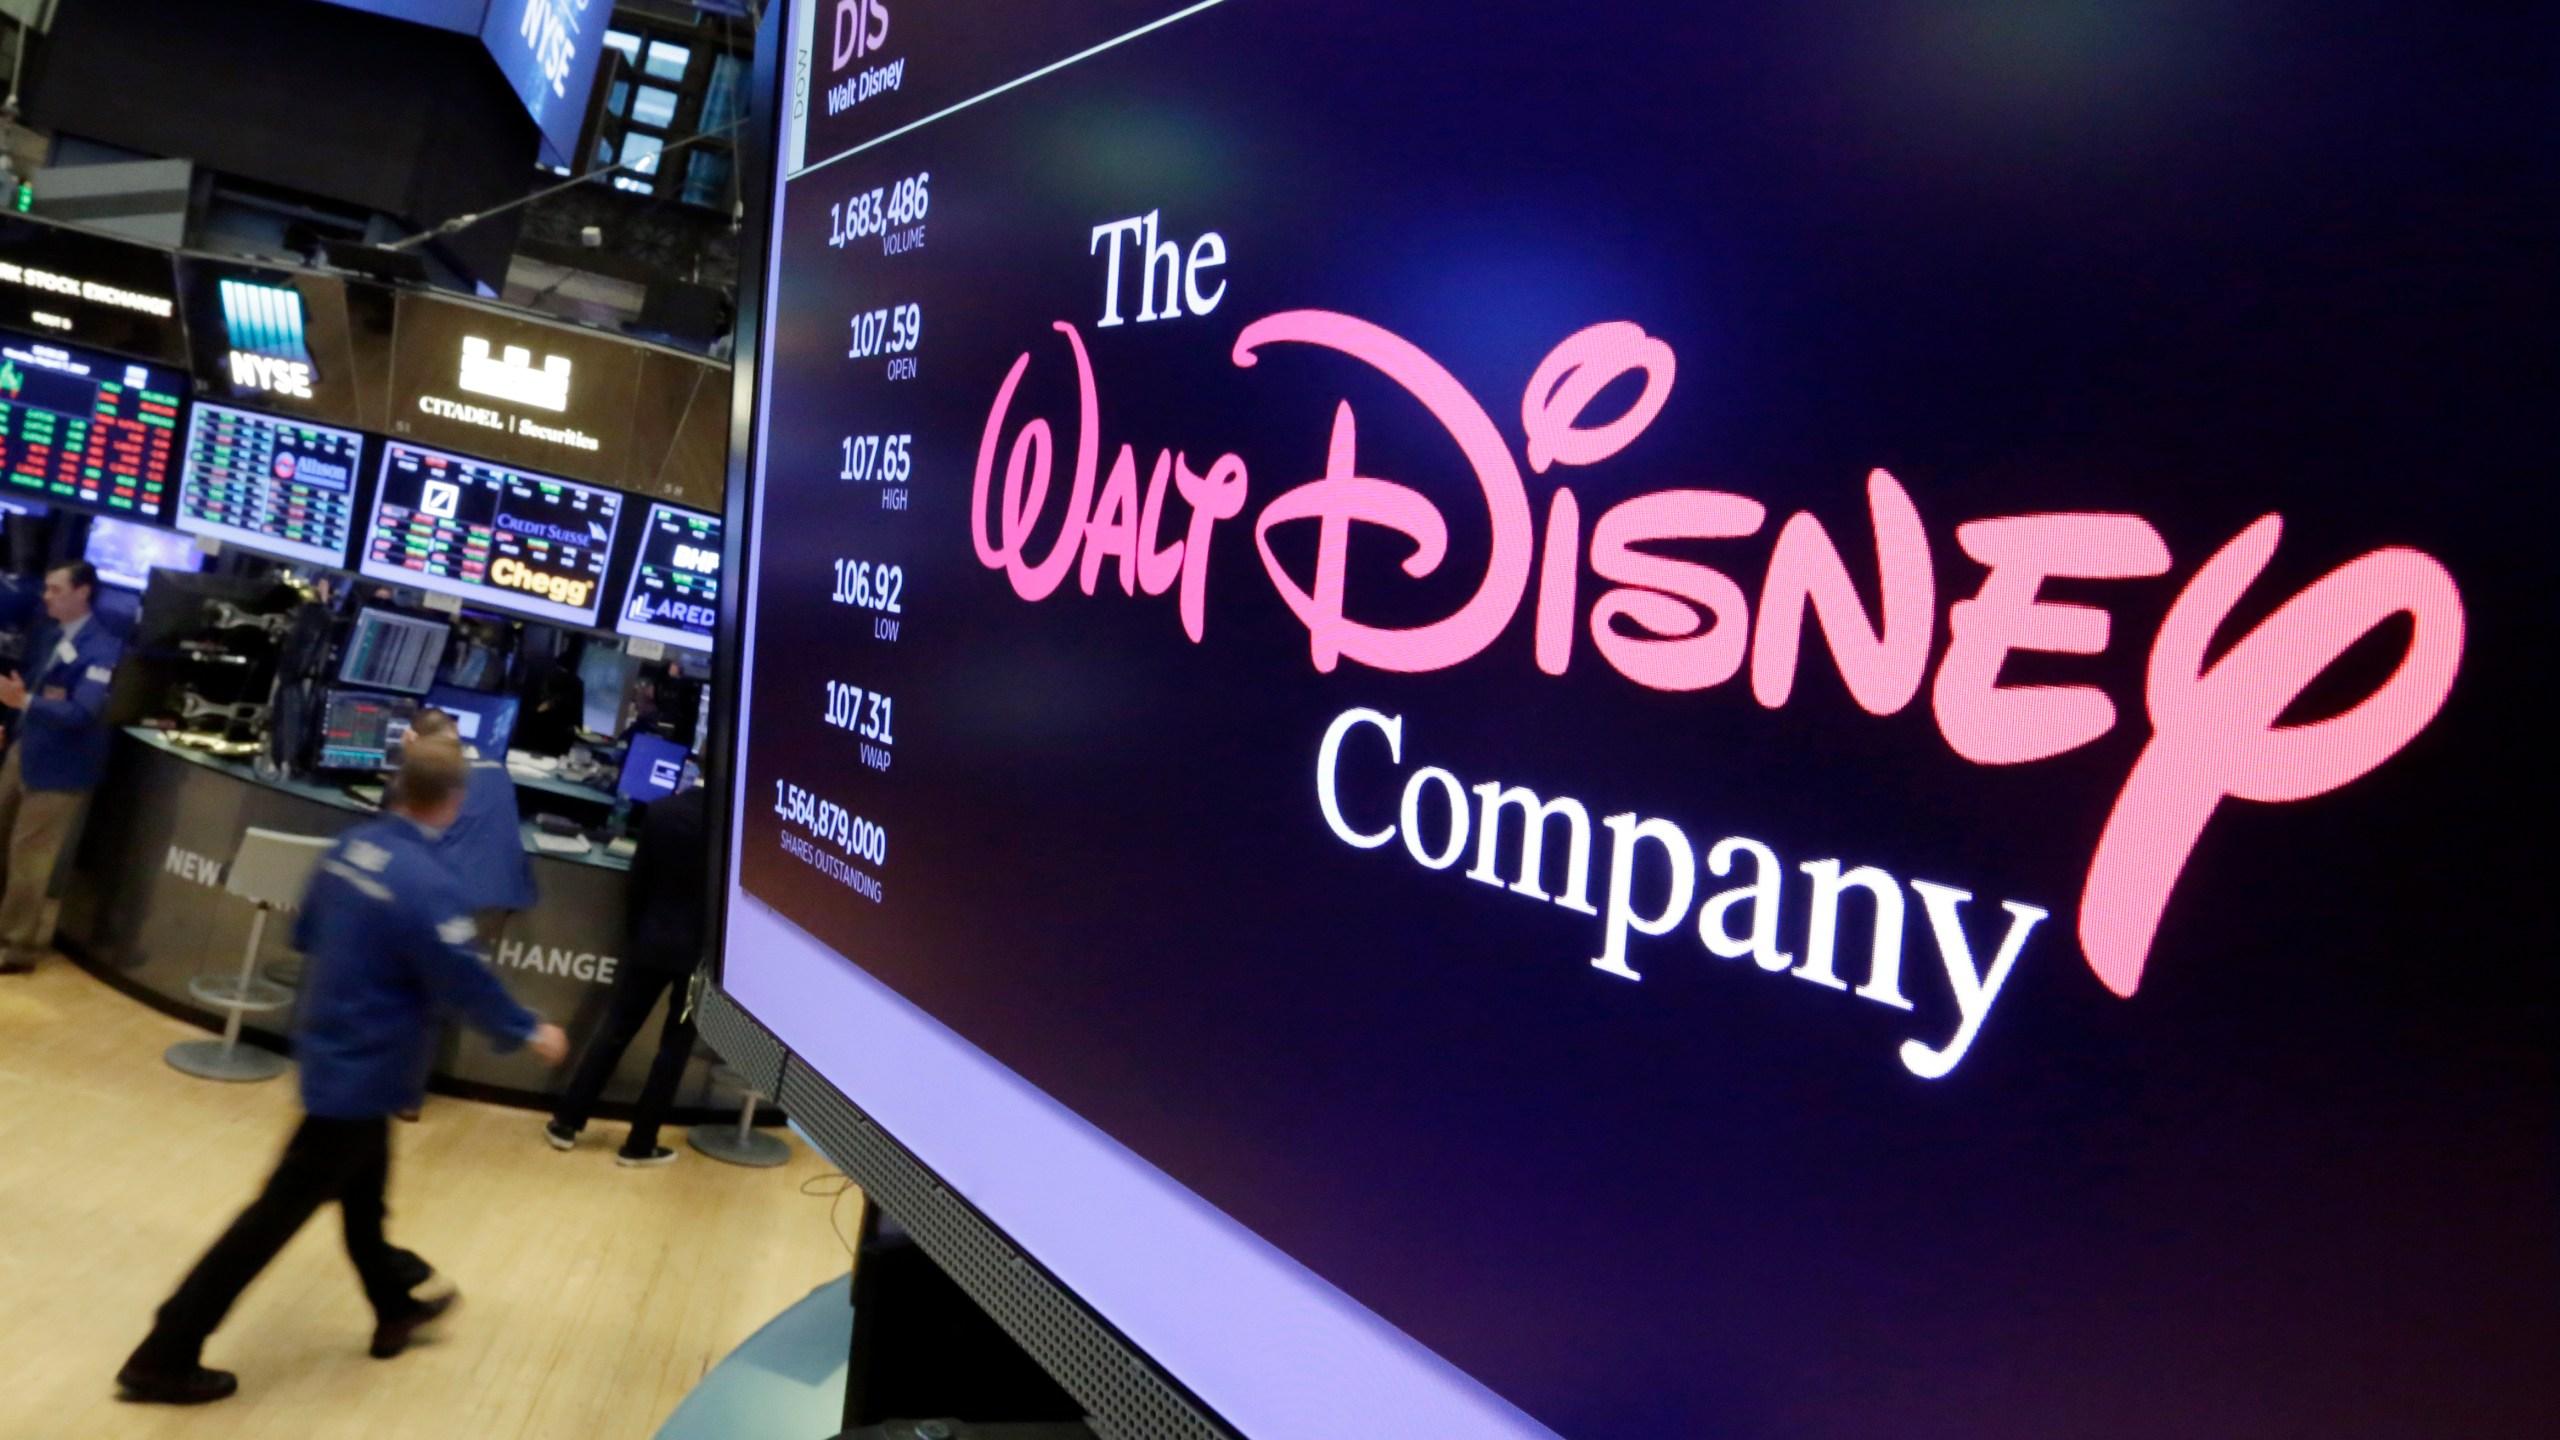 Disney Streaming Service_1555254804638